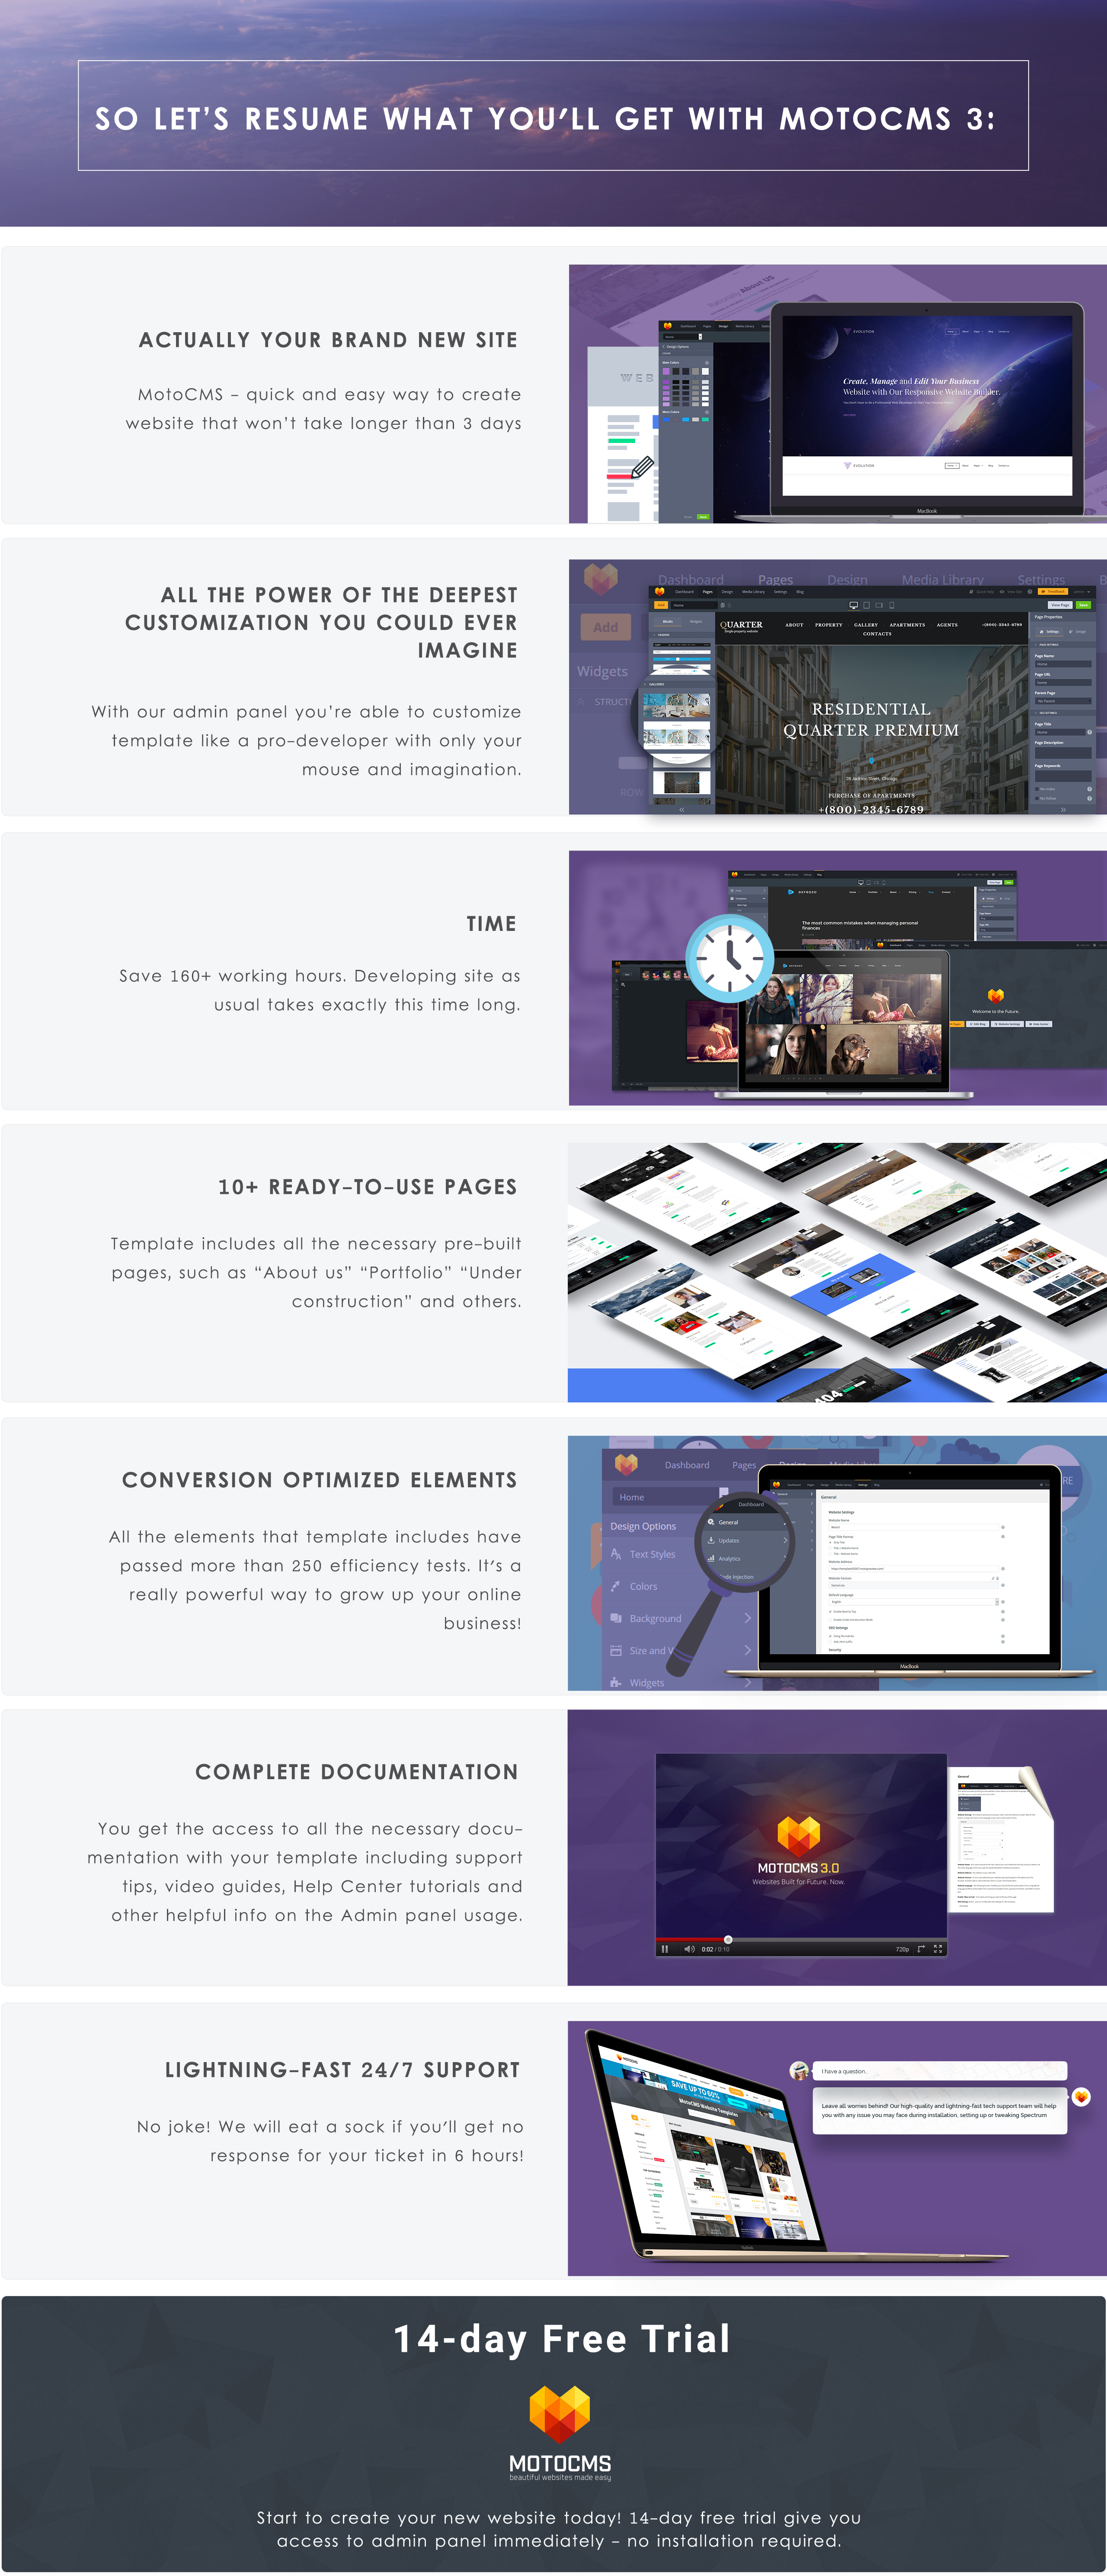 Goalor - Creative Agency Moto CMS 3 Template